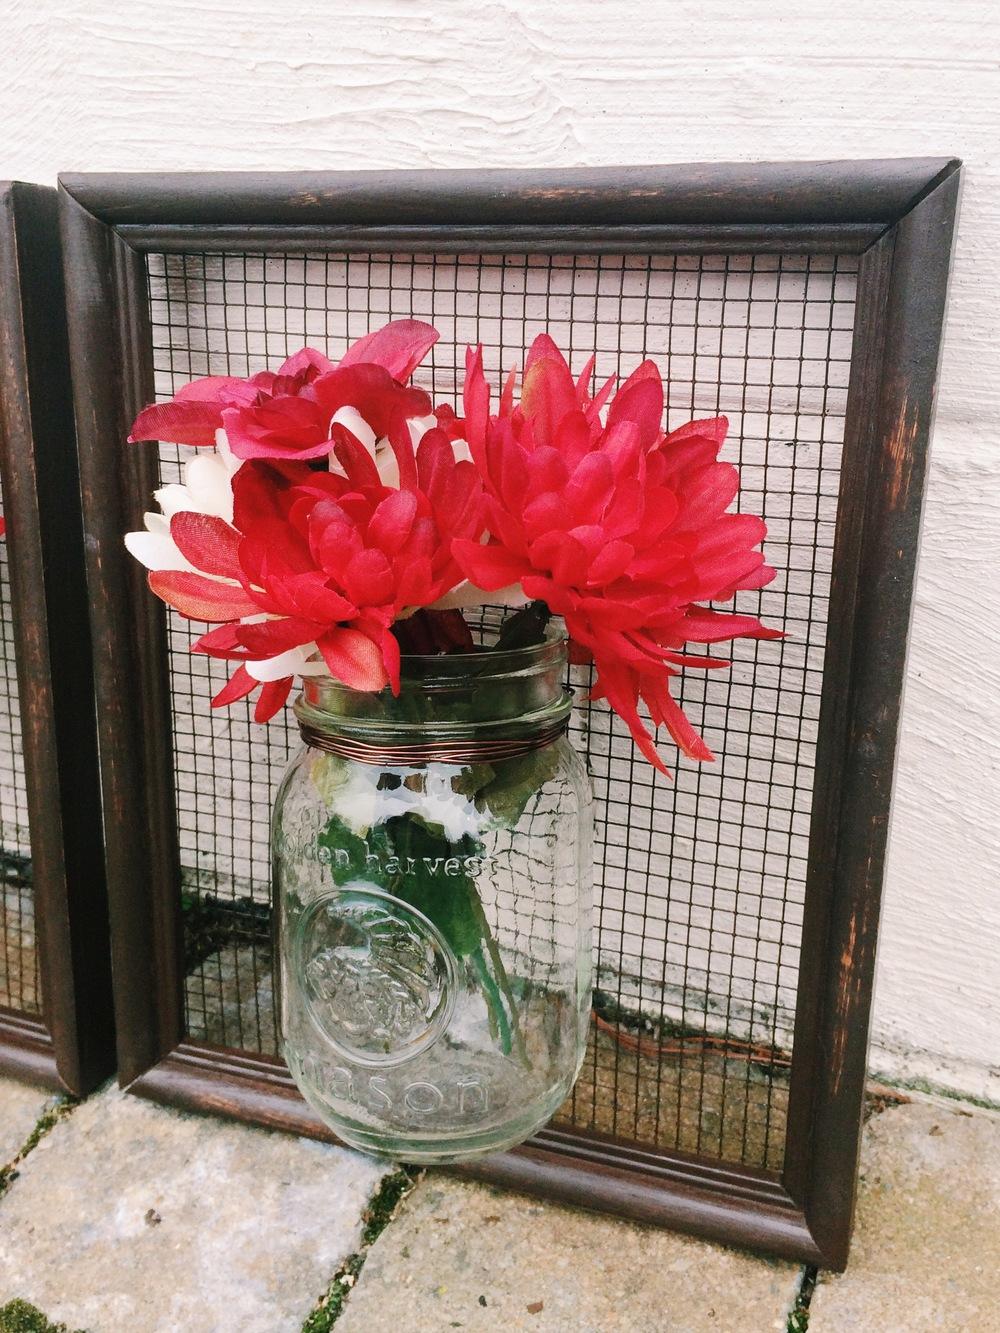 Framed flower vases with hardware cloth or chicken wire maria framed flower vases with hardware cloth or chicken wire maria makes food diy blog reviewsmspy